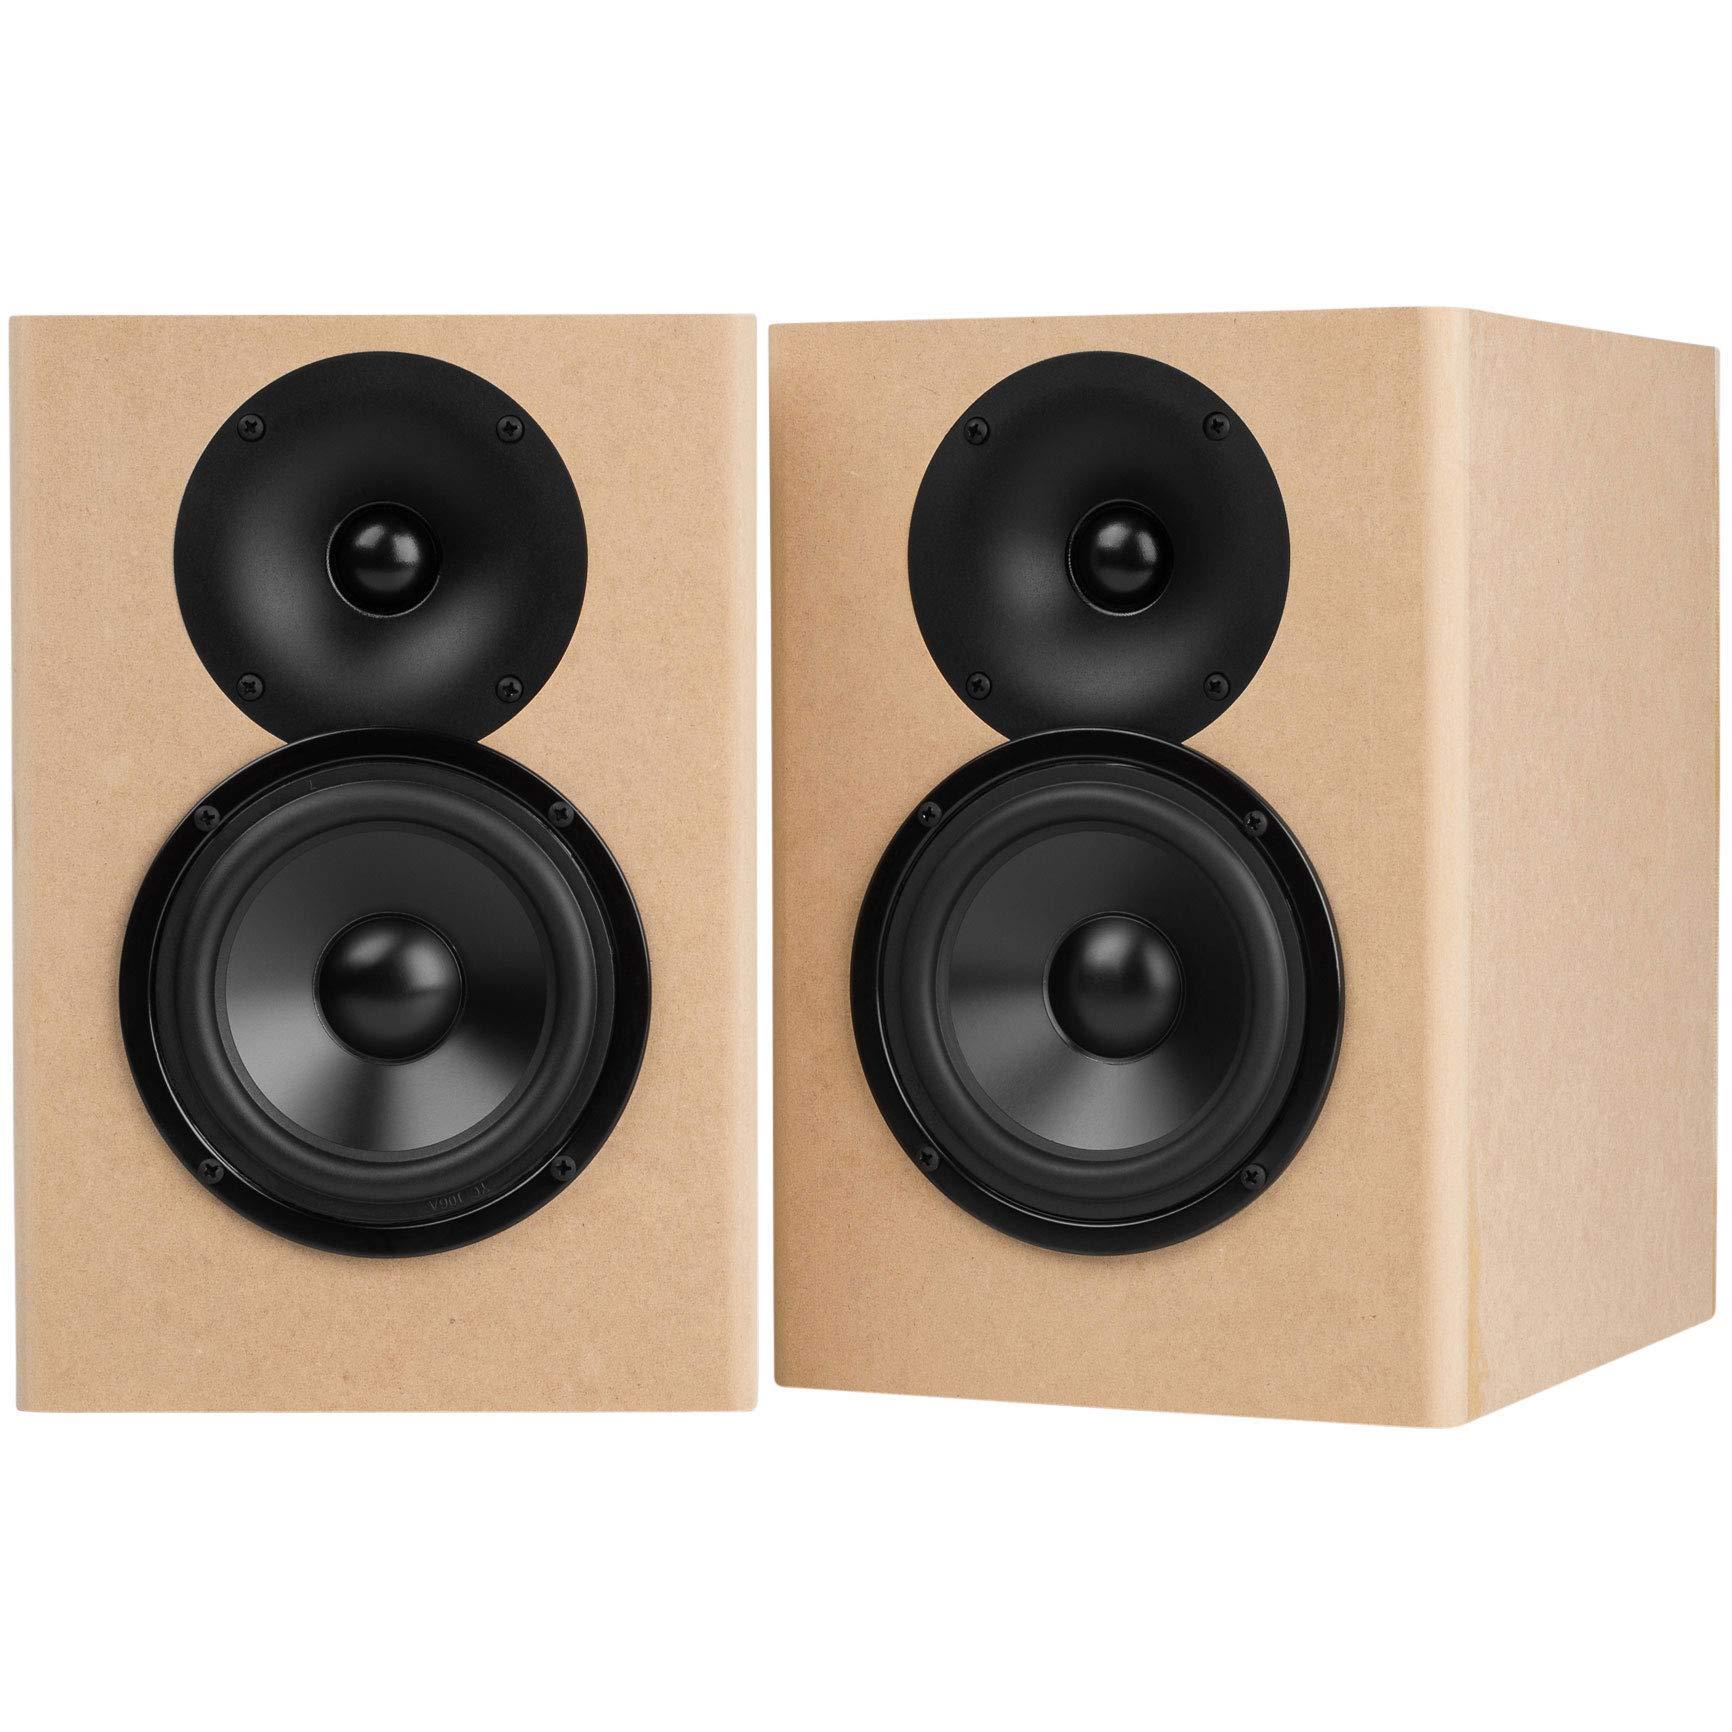 SwansKits Braced Wooden Cabinet DIY 2.2A Black Pair HiVi 2-Way Bookshelf Speaker Kit 2-Year Warranty